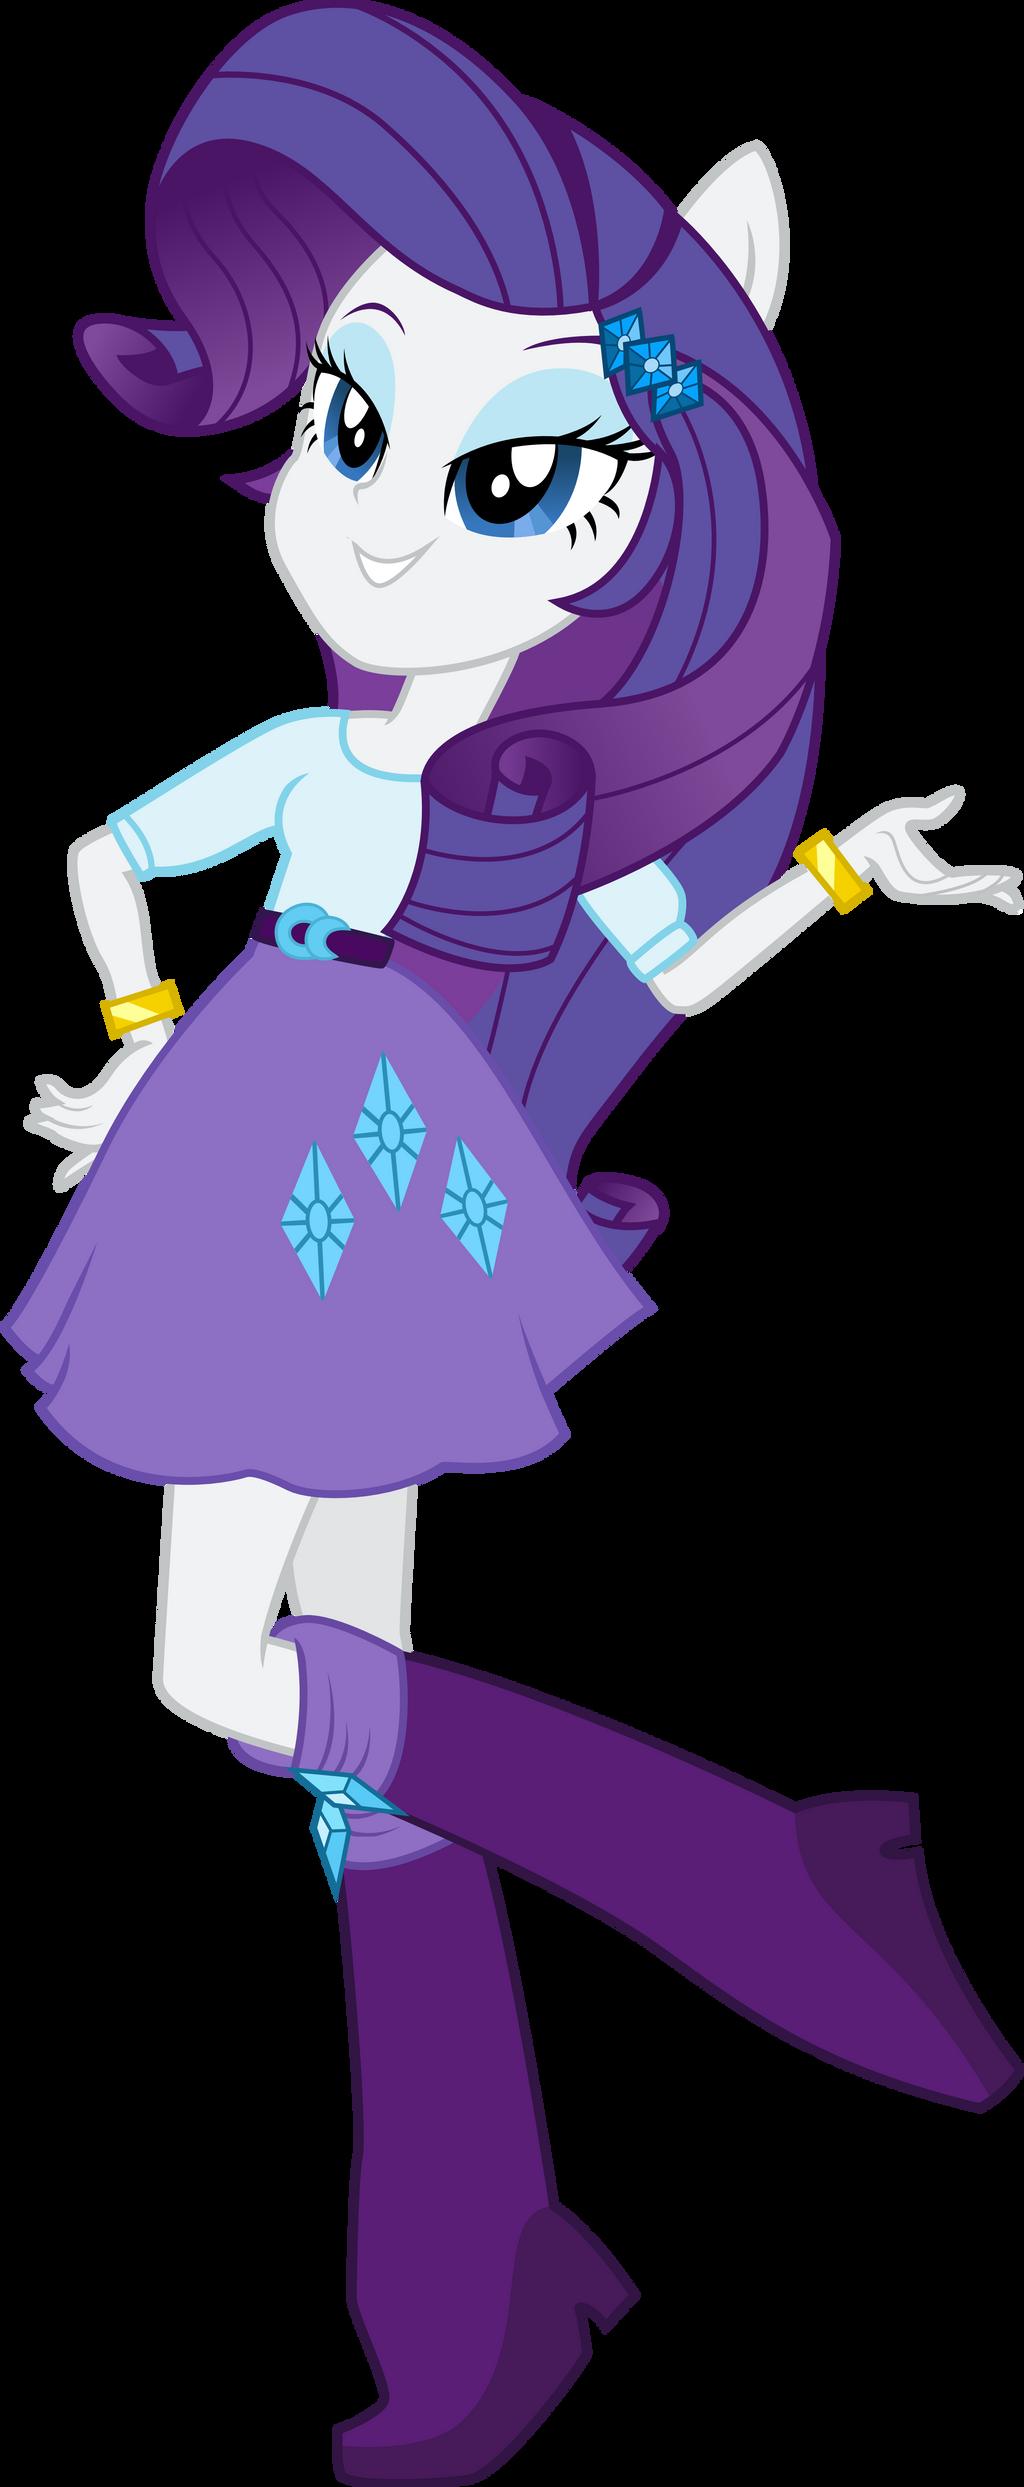 rarity equestria girl